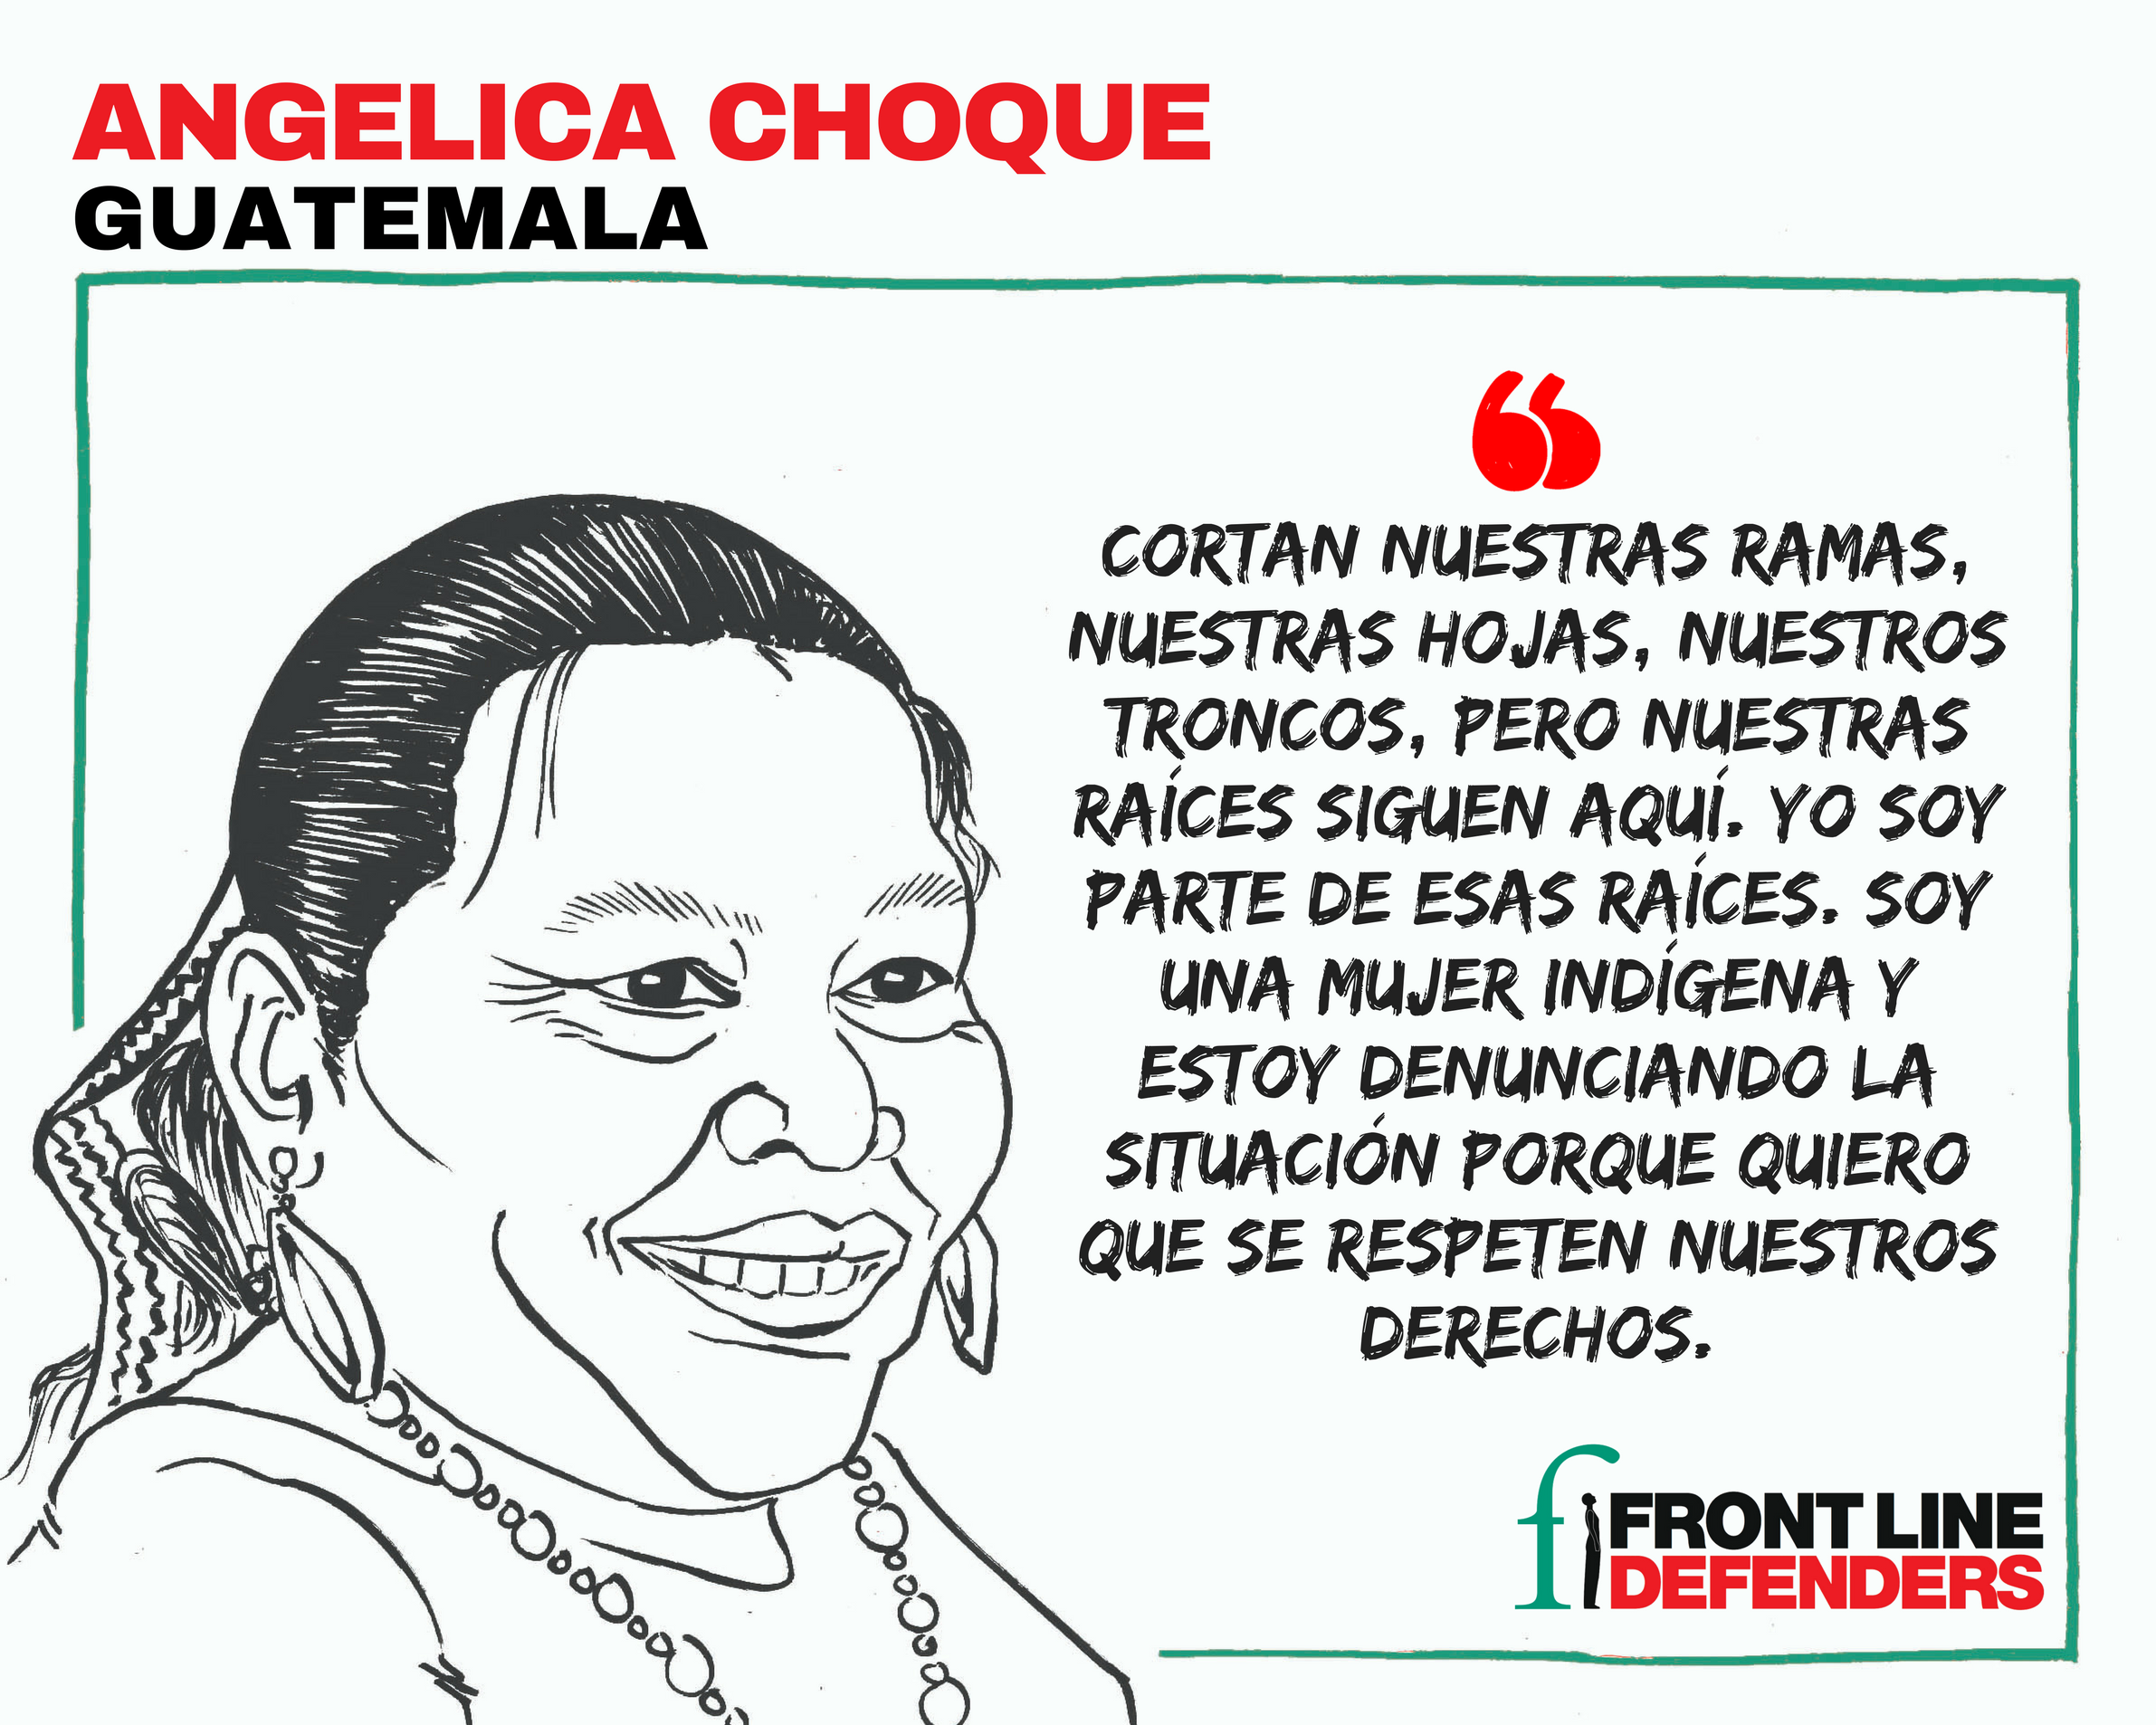 Angelica Cho - Guatemala. credit: Aseem trivedi